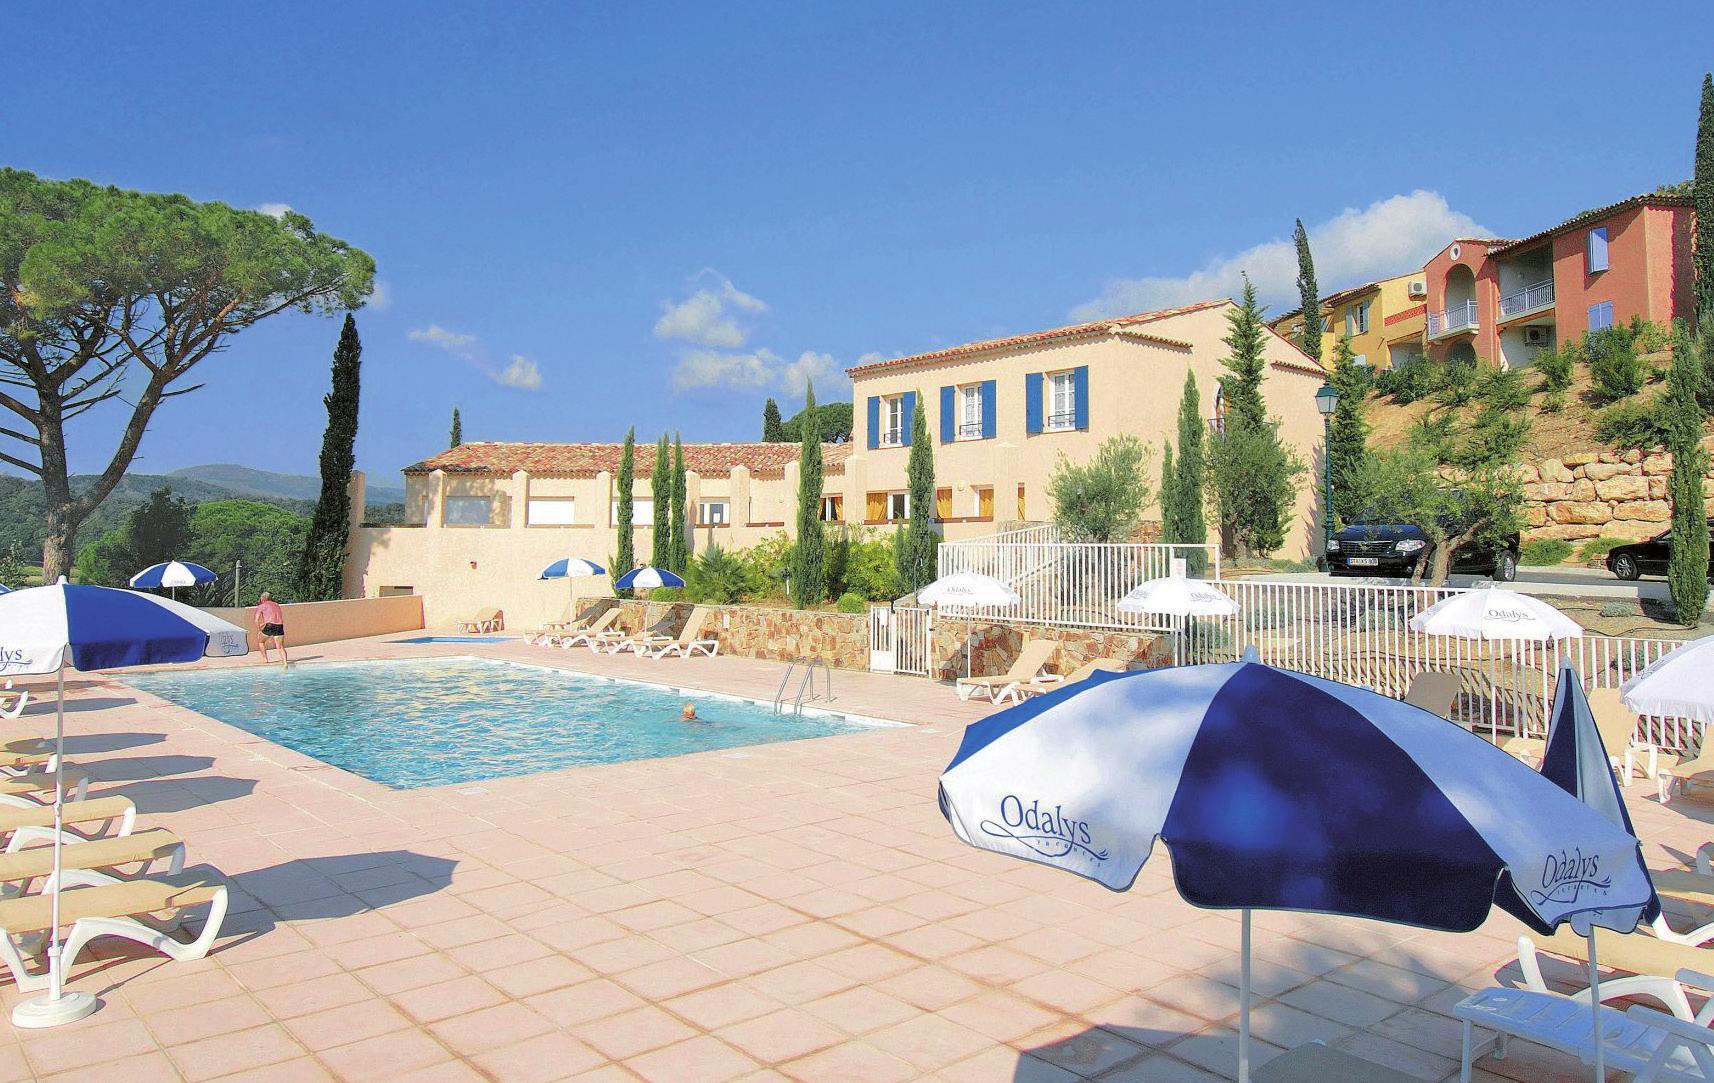 odalys-investir-lmnp-residence-tourisme